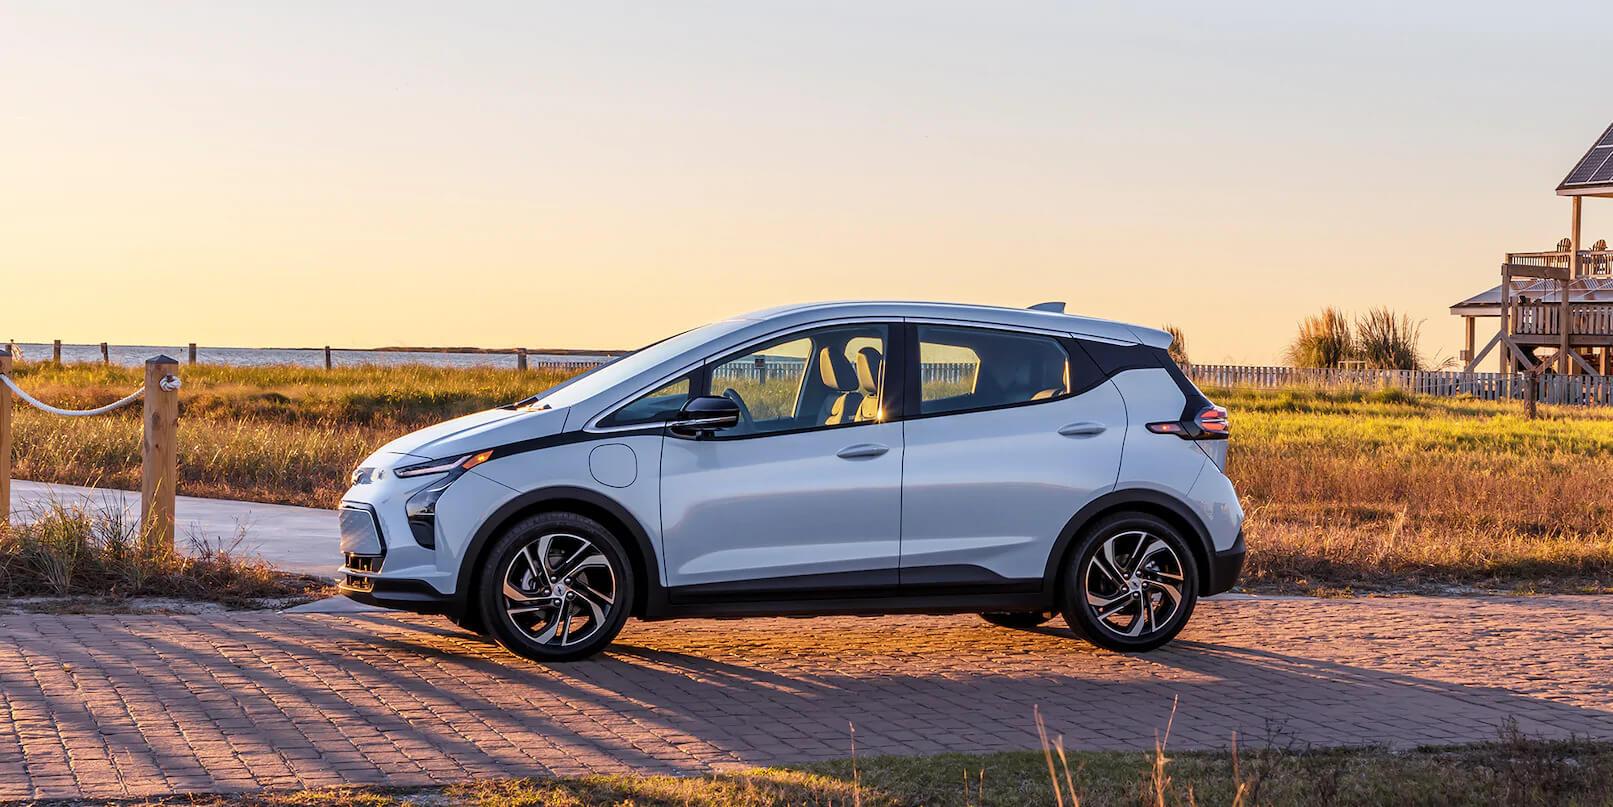 2022 Chevrolet Bolt EV Safety With Smart Reflexes.